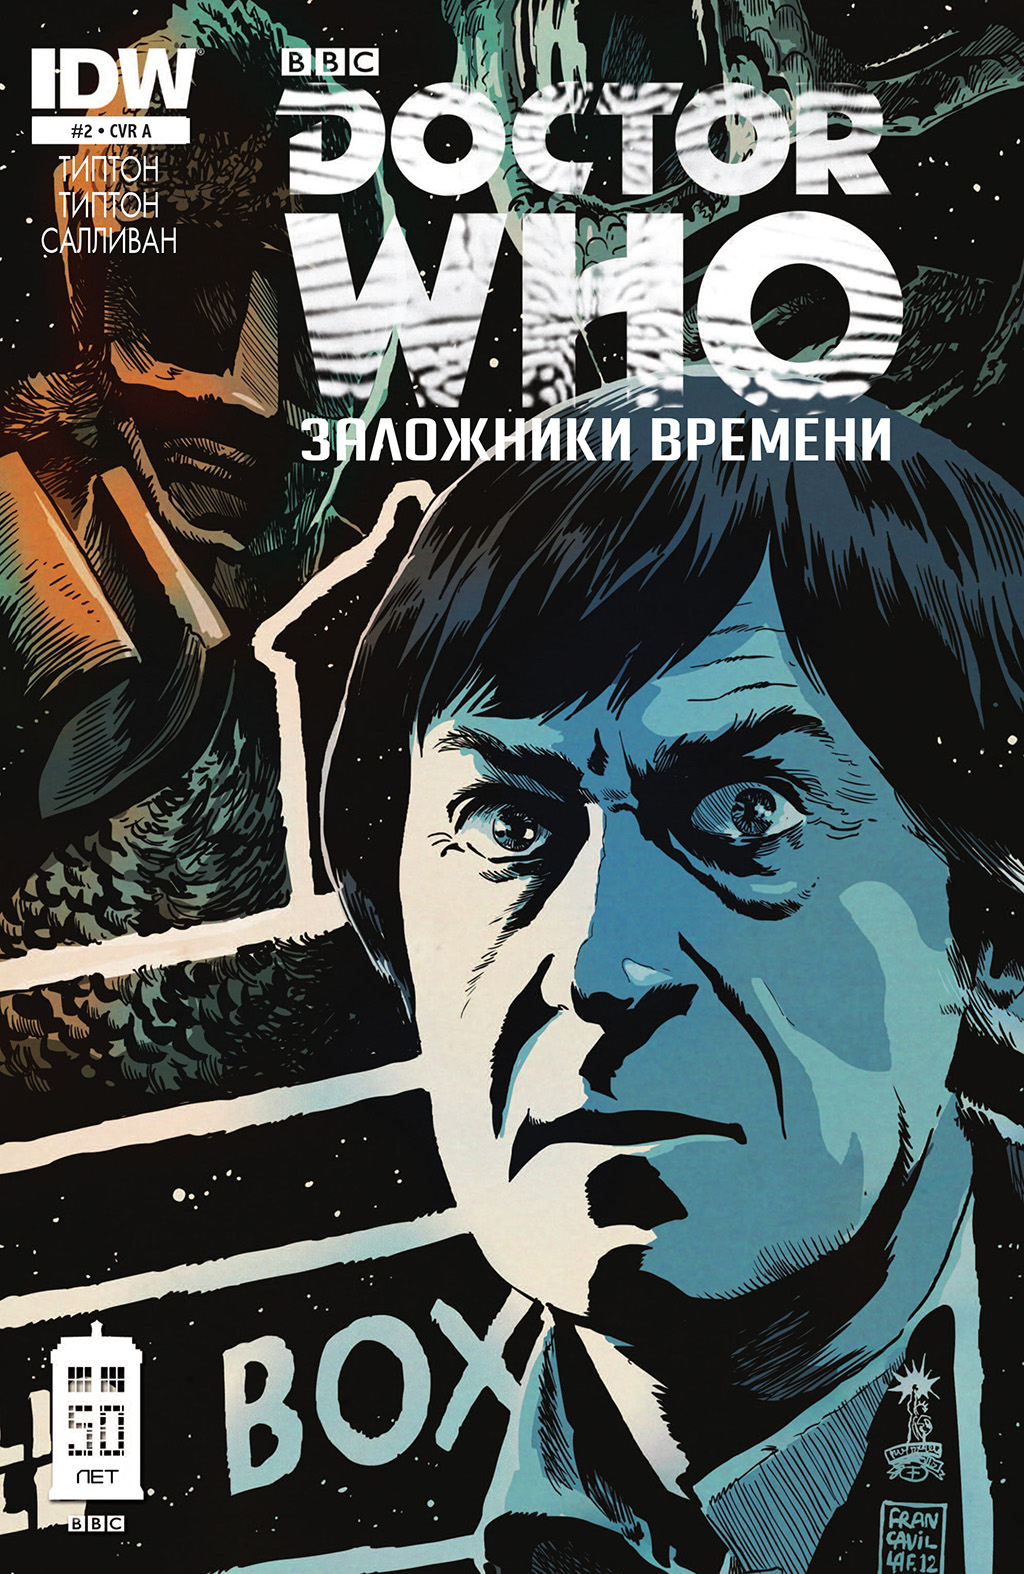 Комикс Доктор Кто - Заложники времени